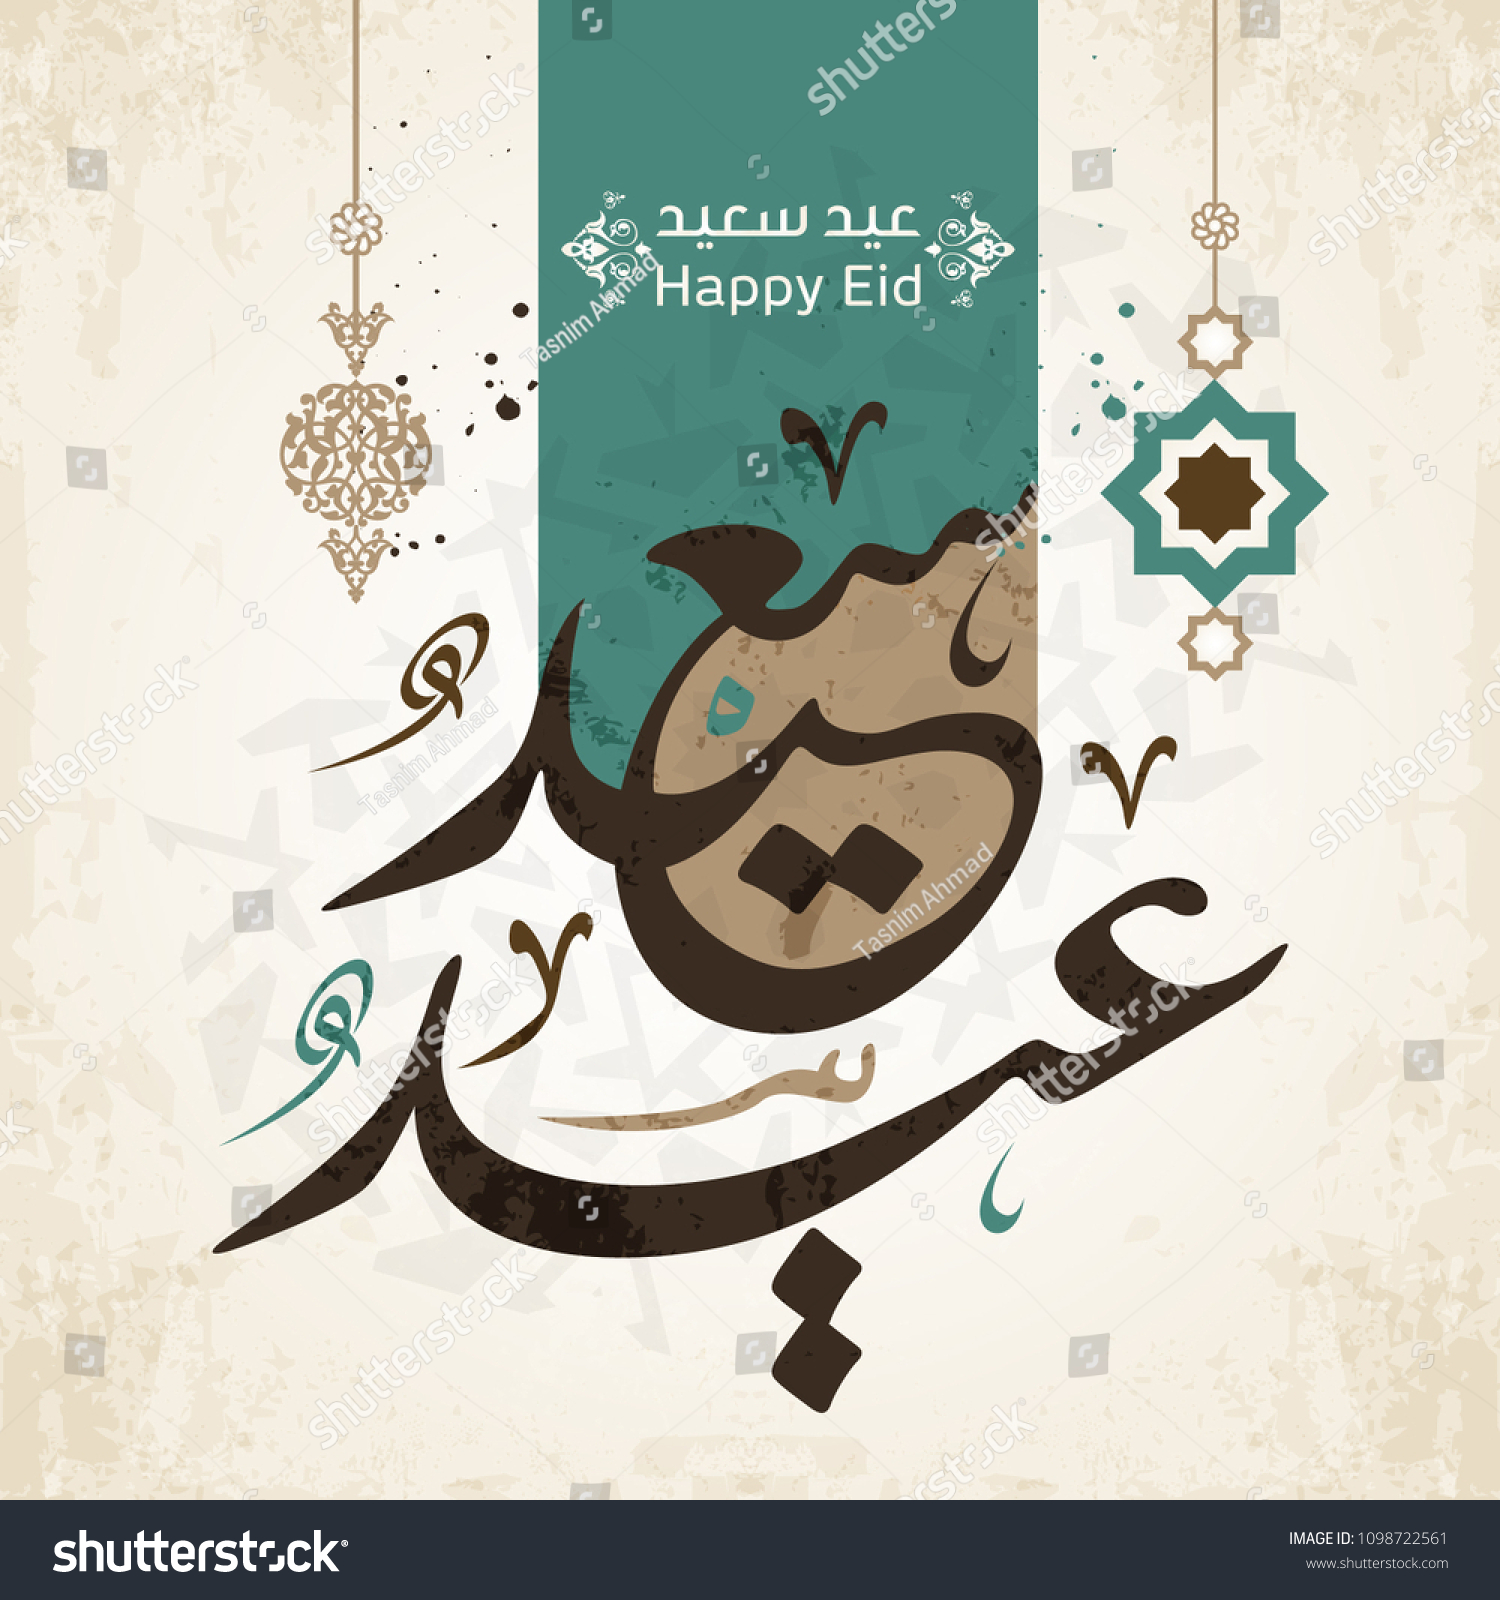 Happy Eid Arabic Calligraphy Greetings You Stock Vector 1098722561